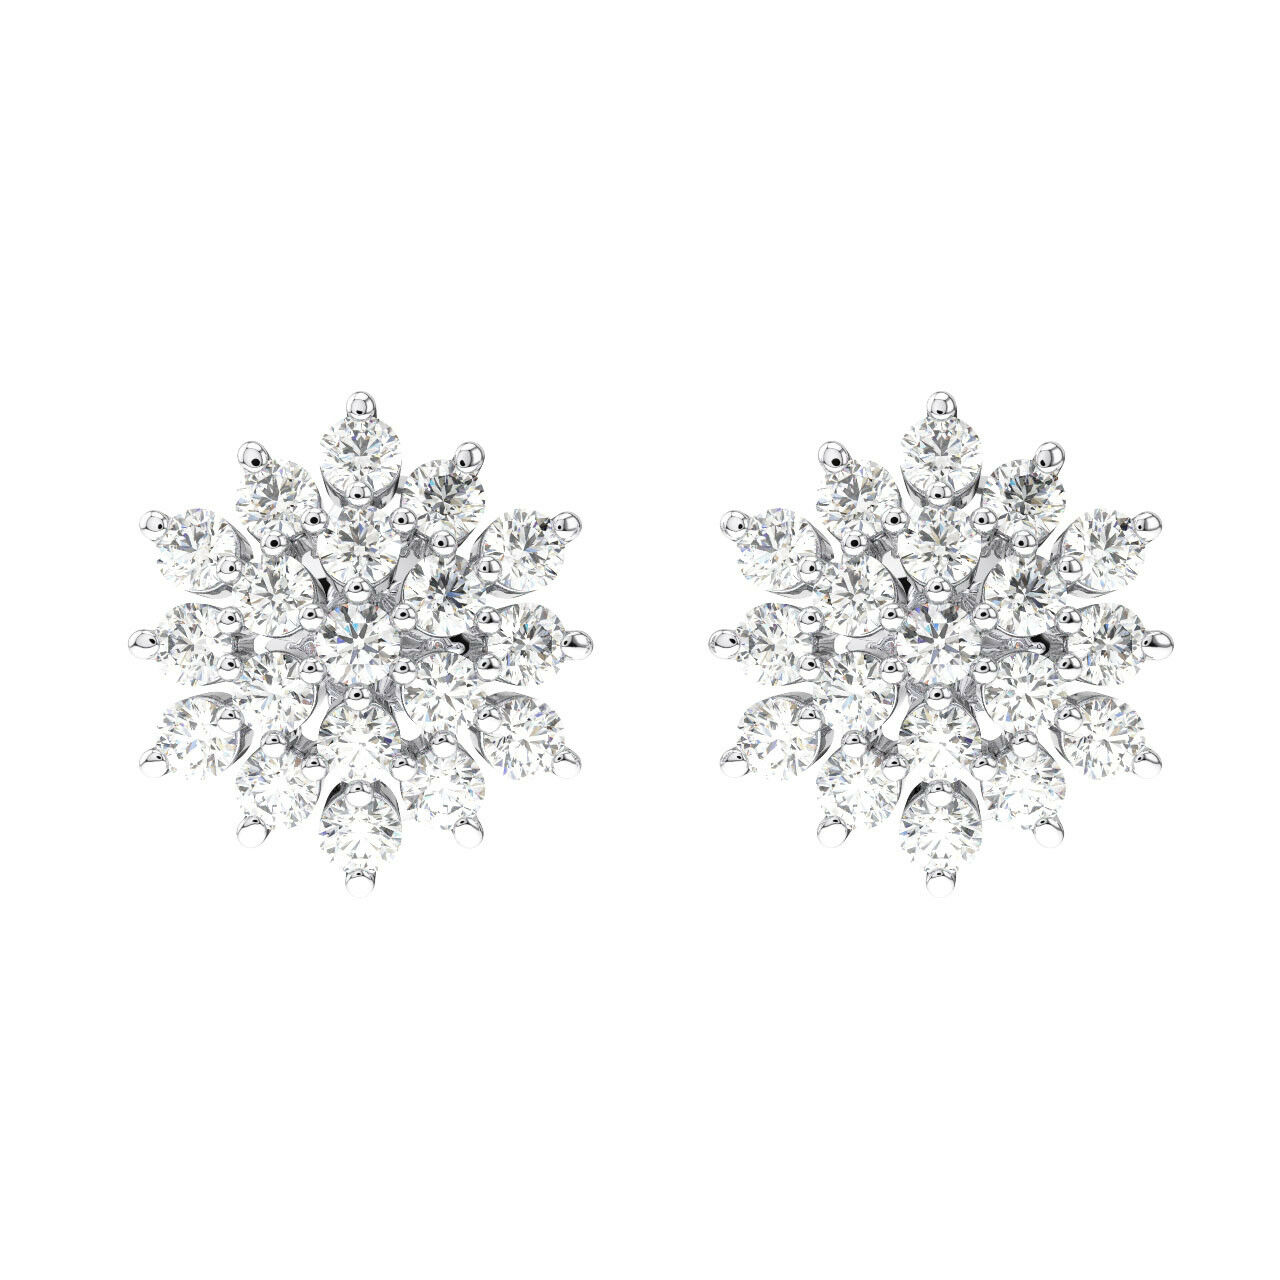 0.50 Carat Round Brilliant Cut Diamonds Cluster Studs Earring in 18K gold